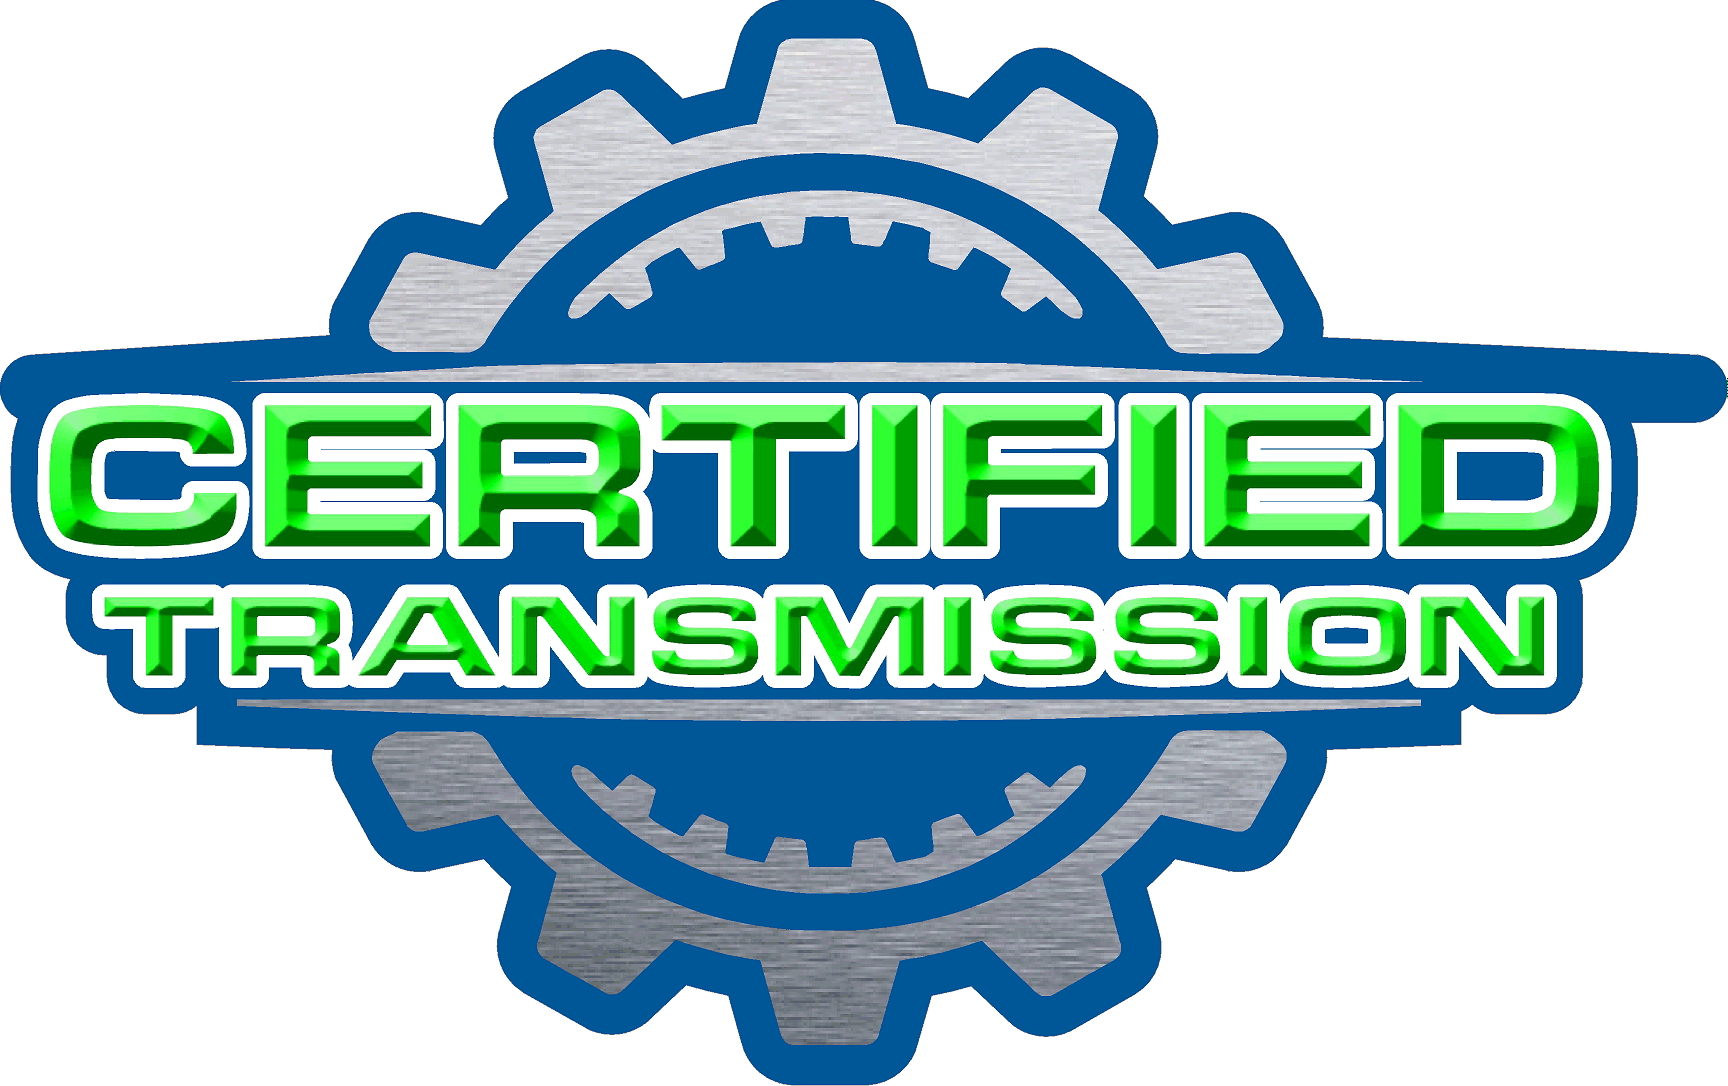 Certified Transmission